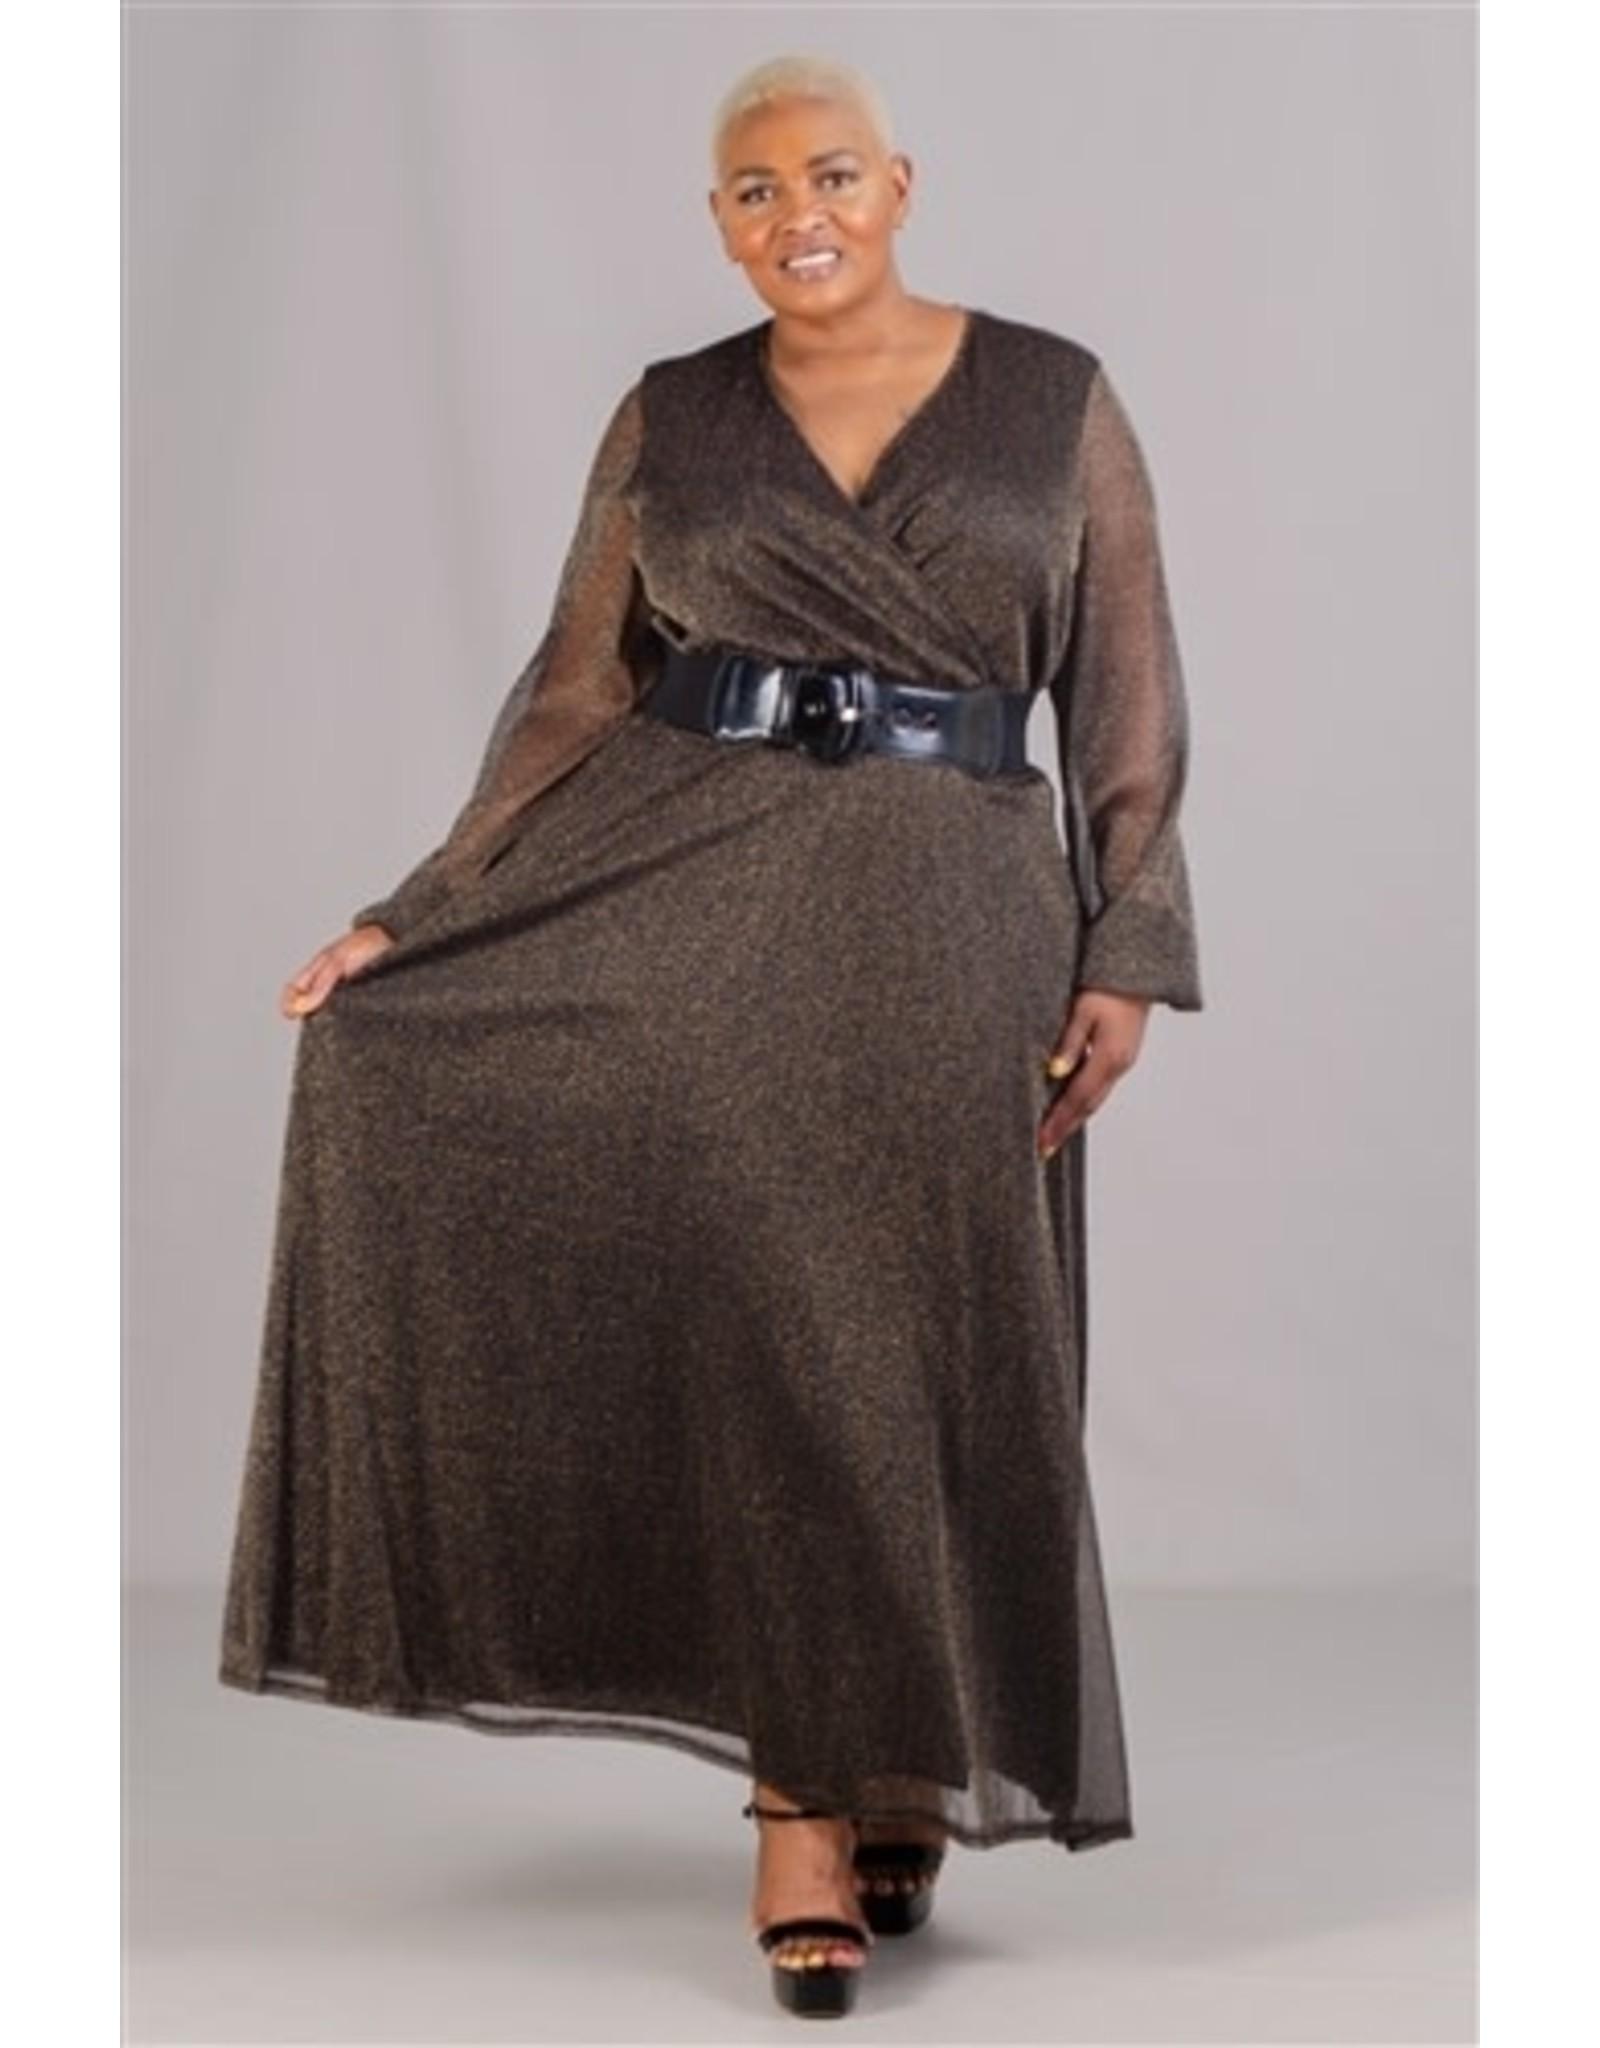 Karen T Black and Gold Sheer Shimmer Maxi Dress